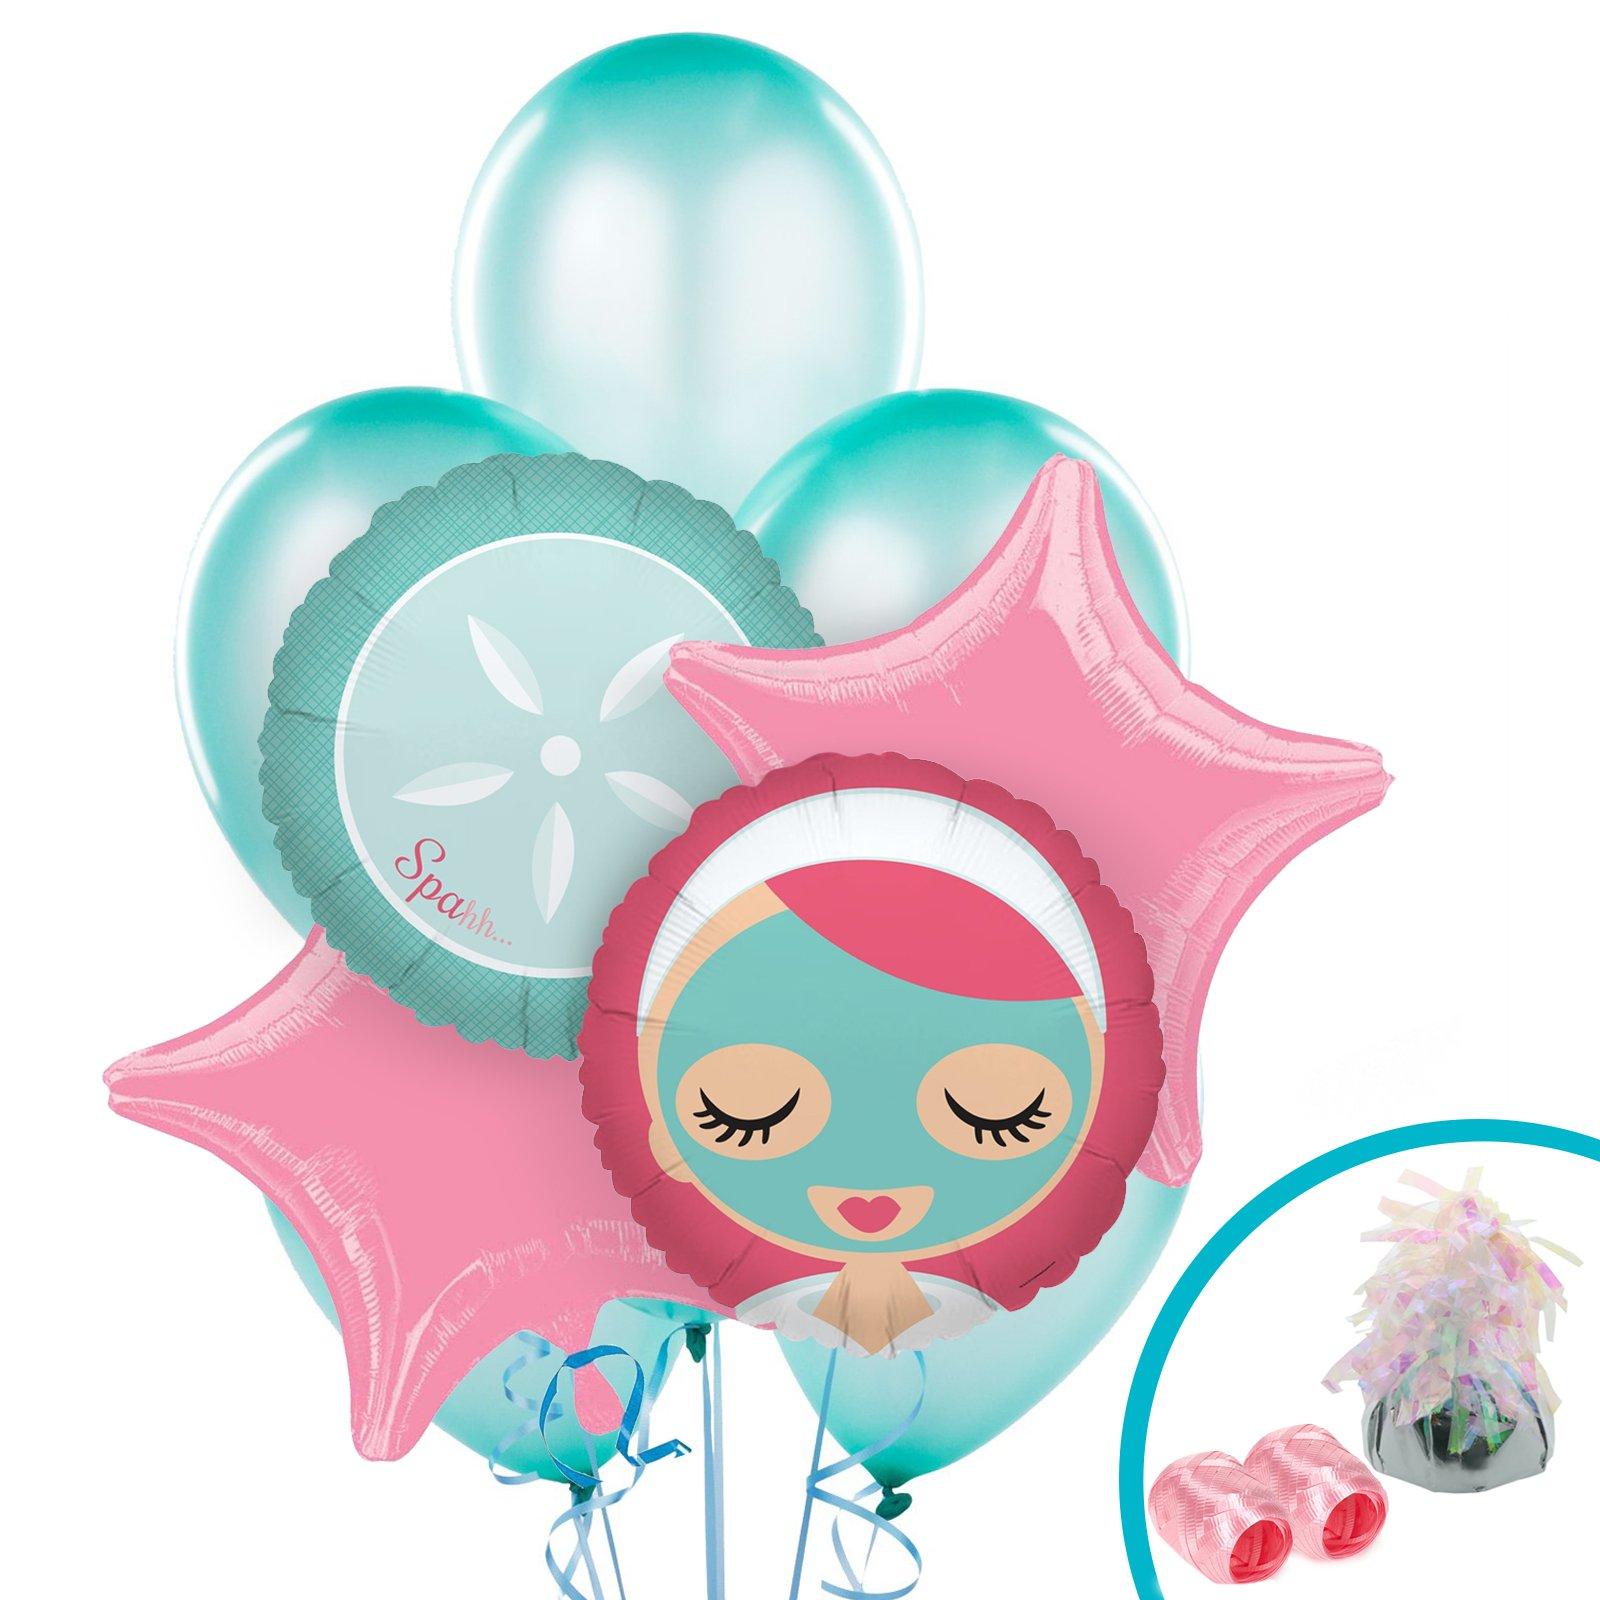 1600x1600 Little Spa Party Balloon Bouquet